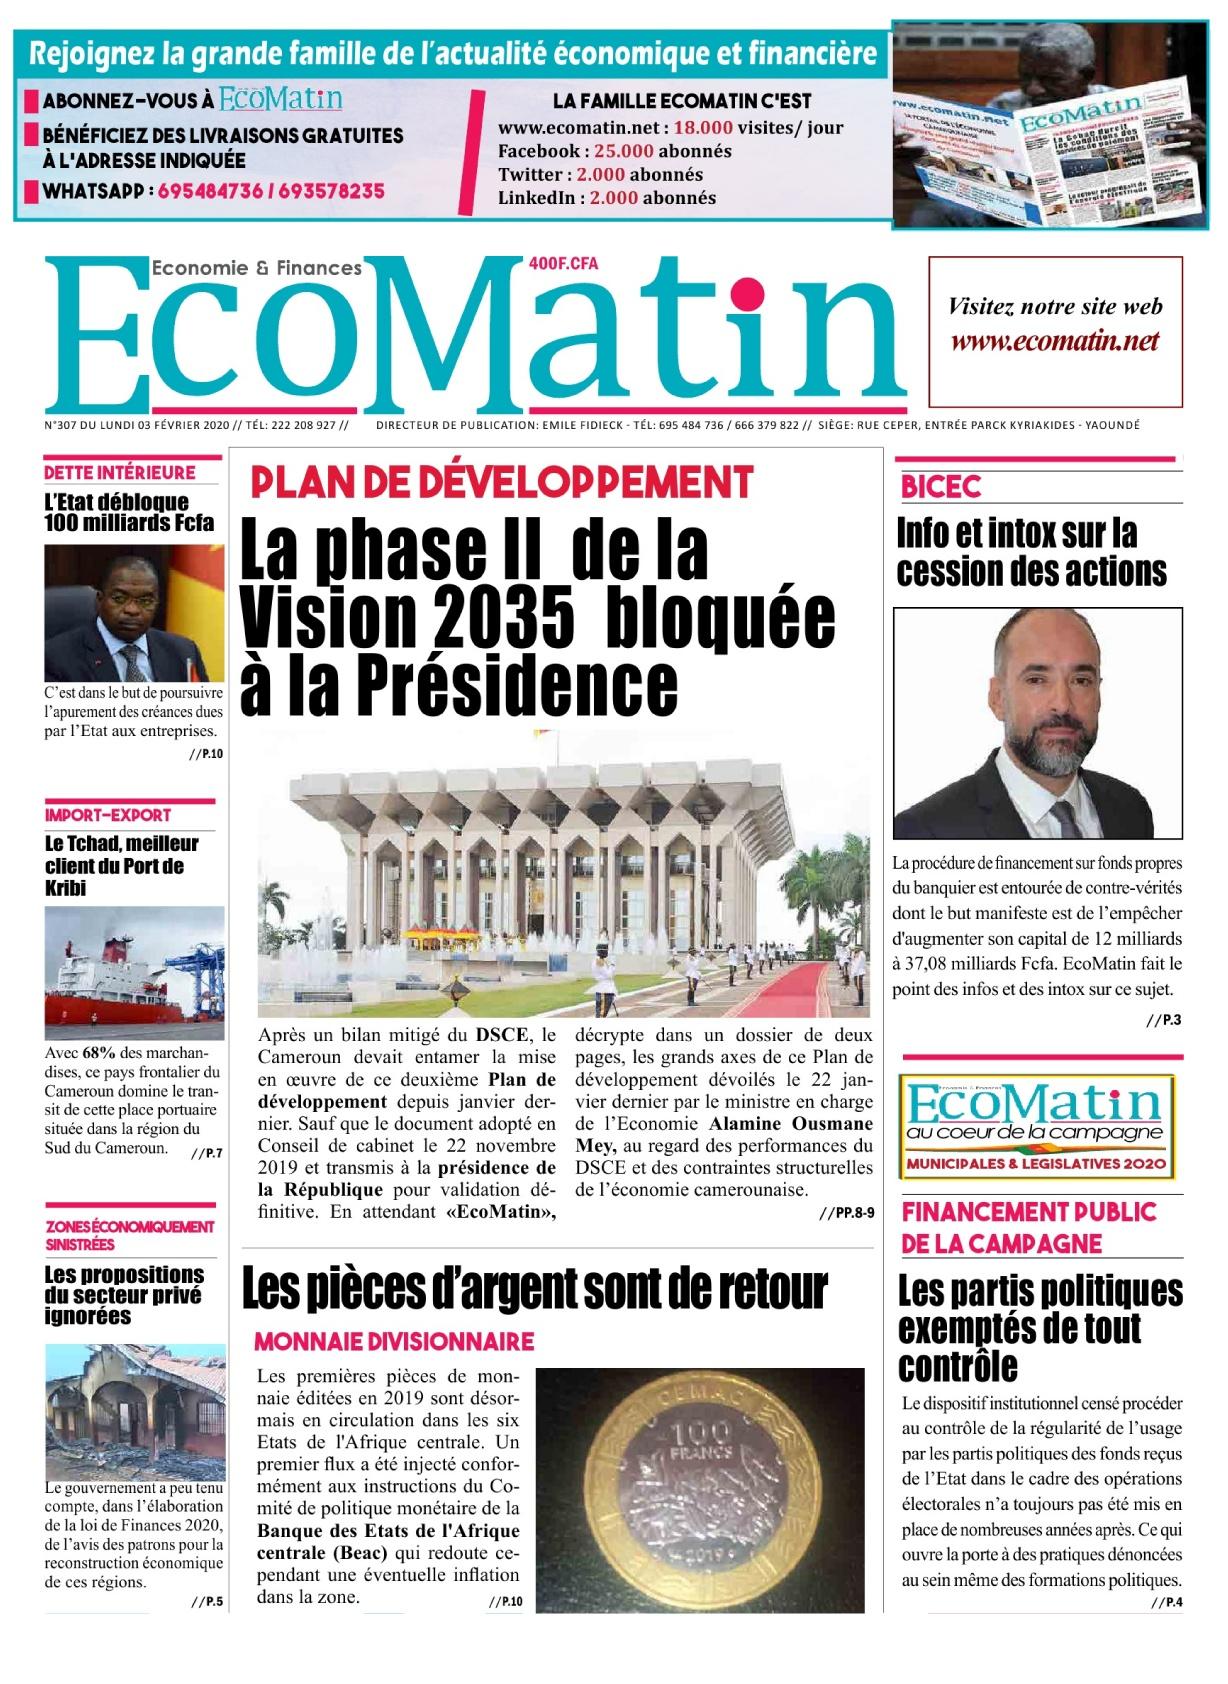 Ecomatin - 13/02/2020